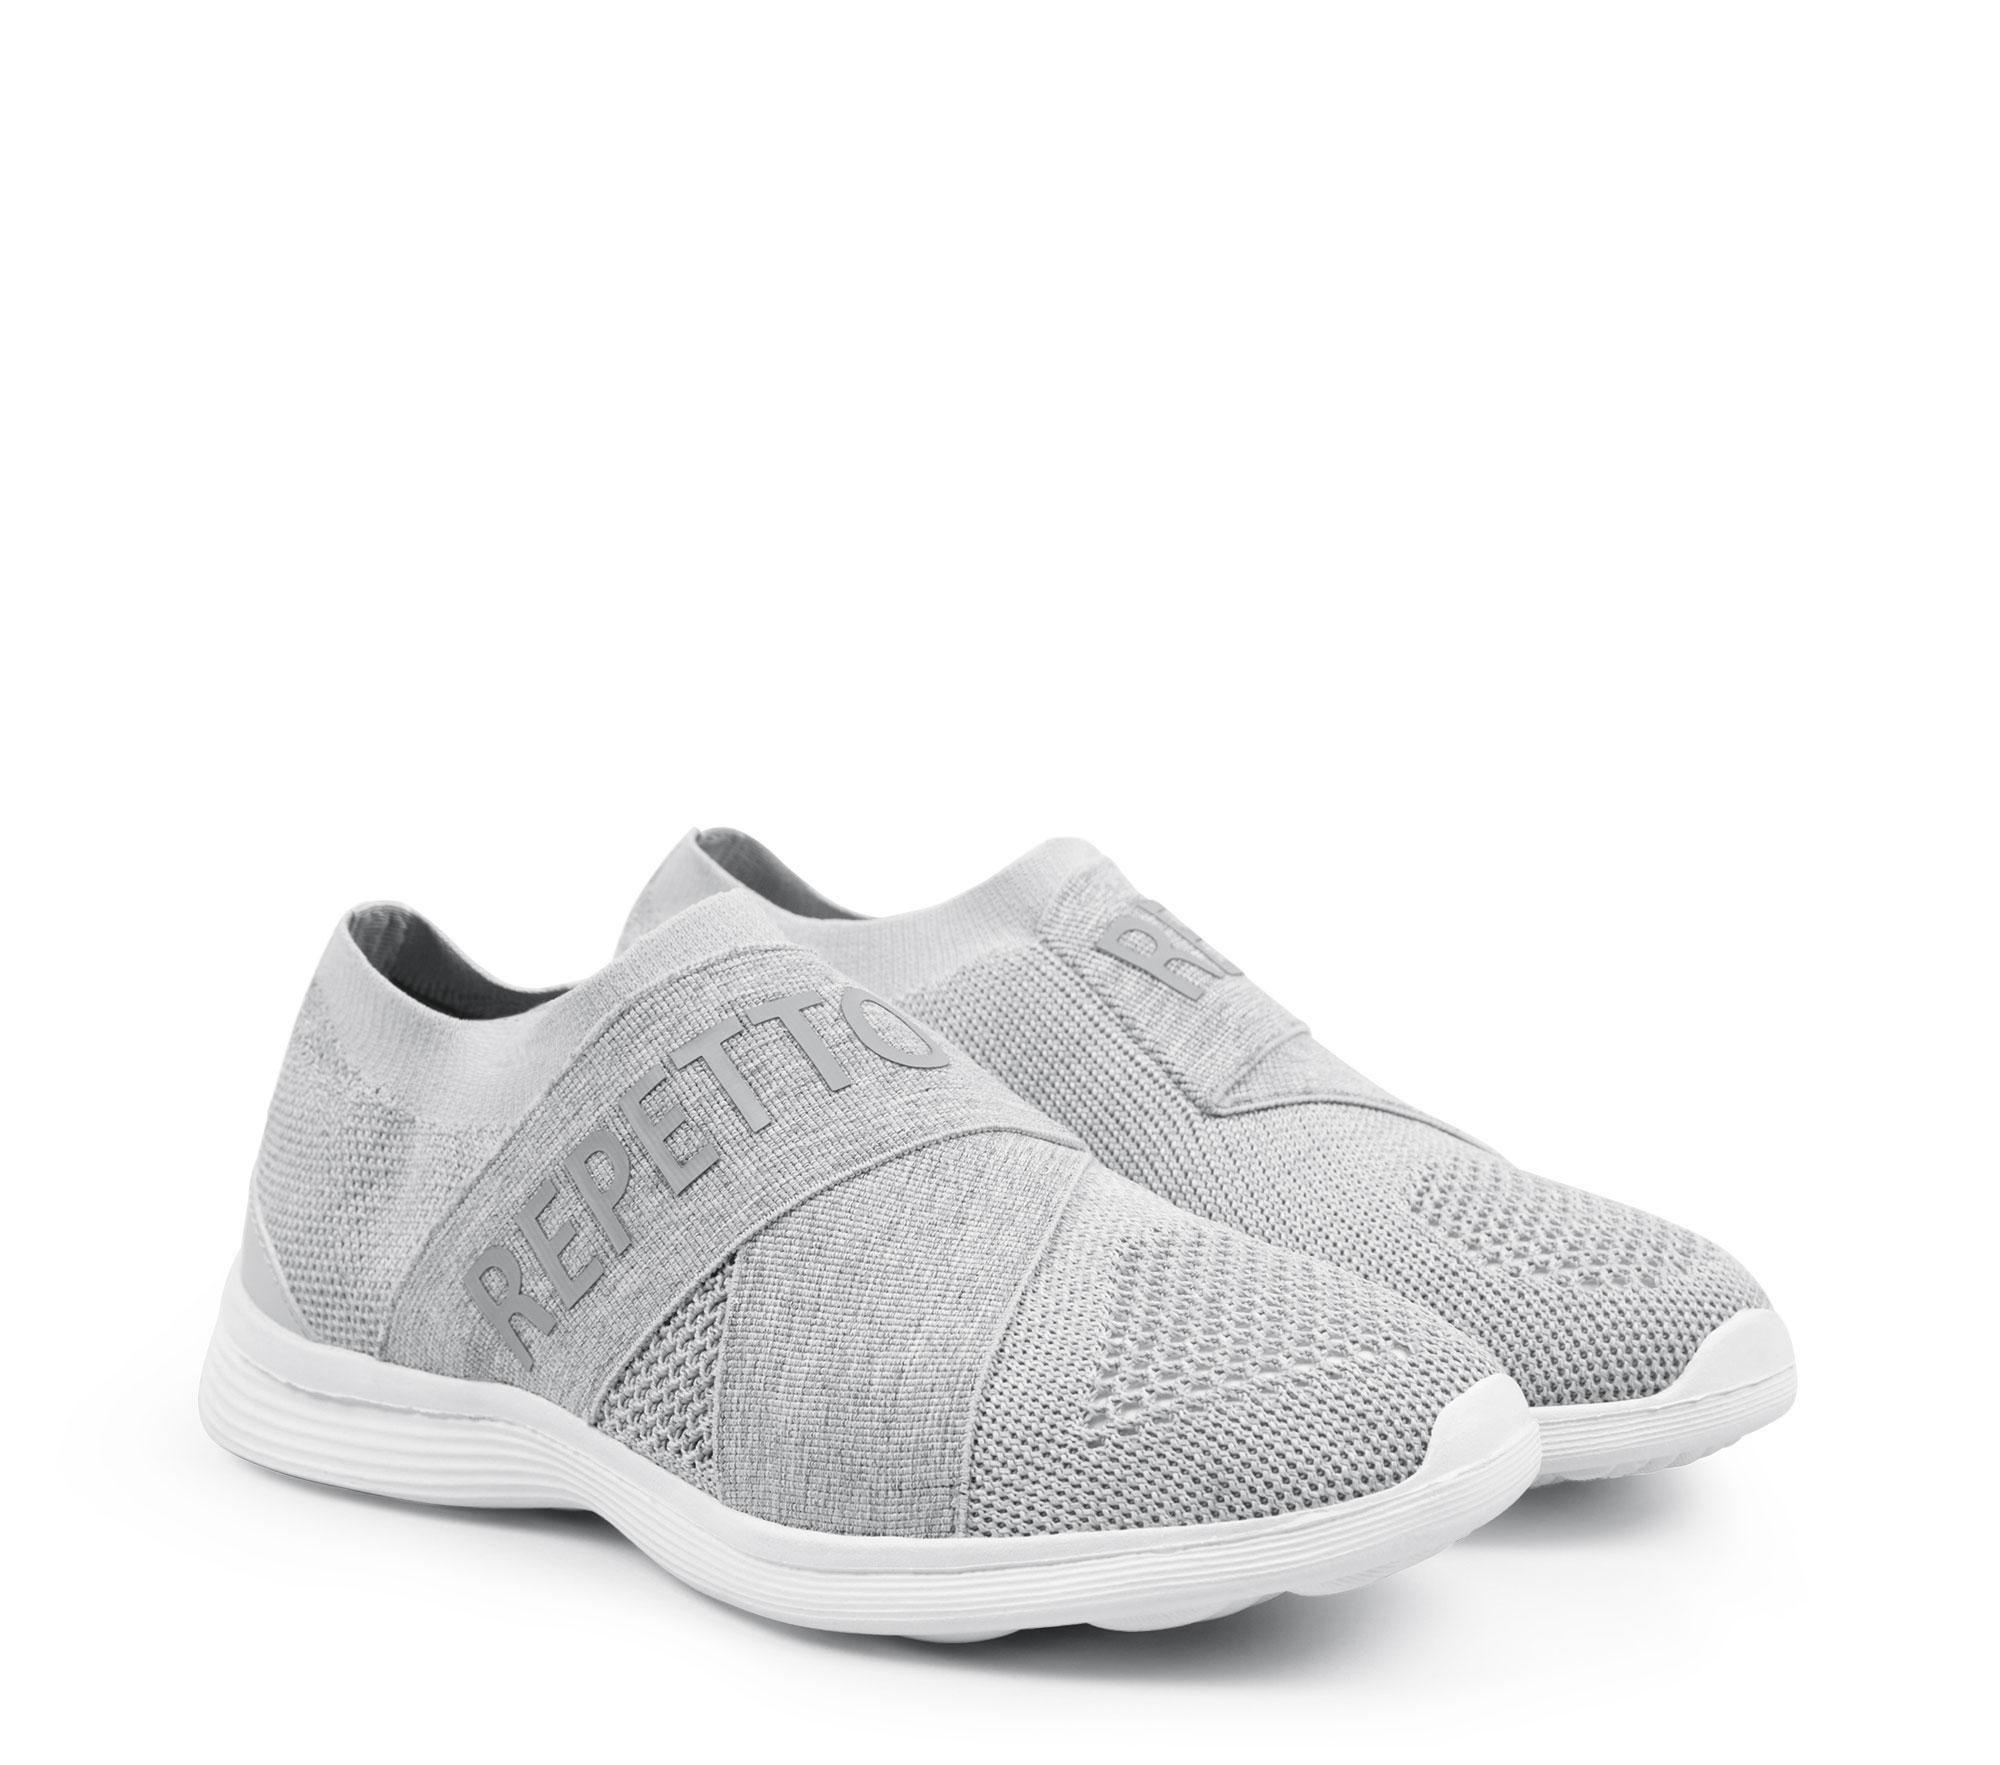 Dance sneakers - Shoes - Women